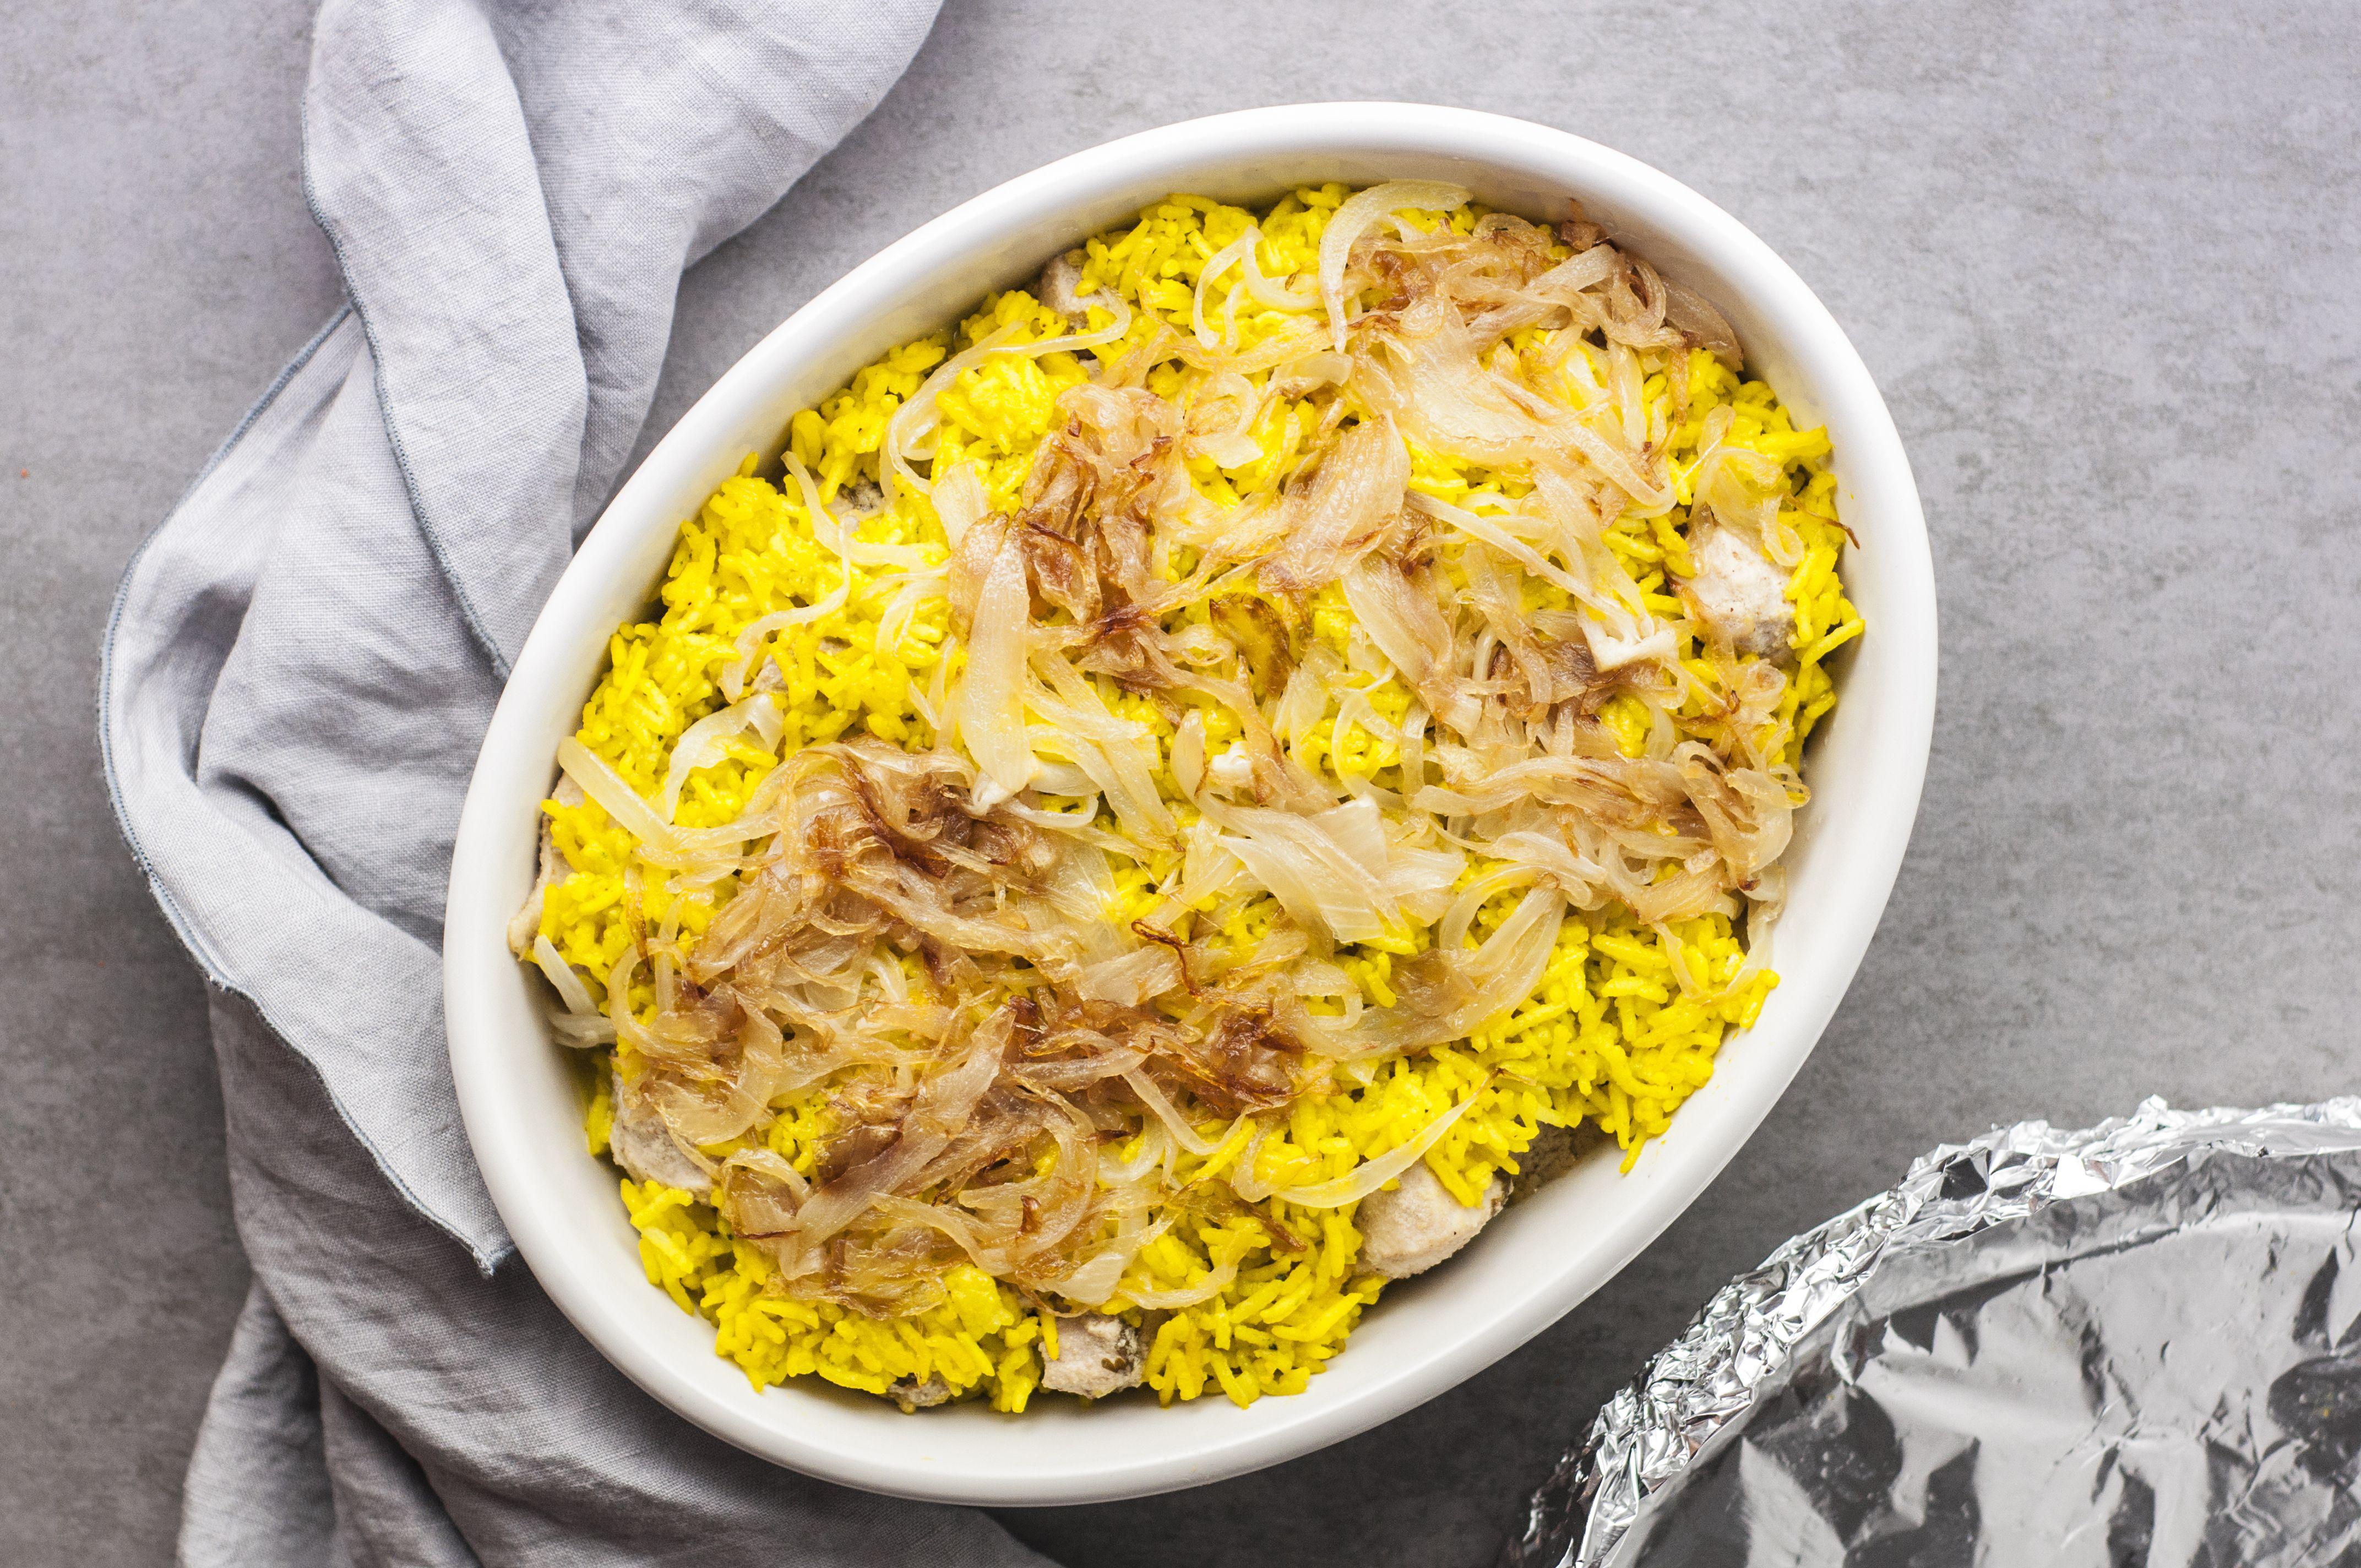 Cooked mughlai biryani